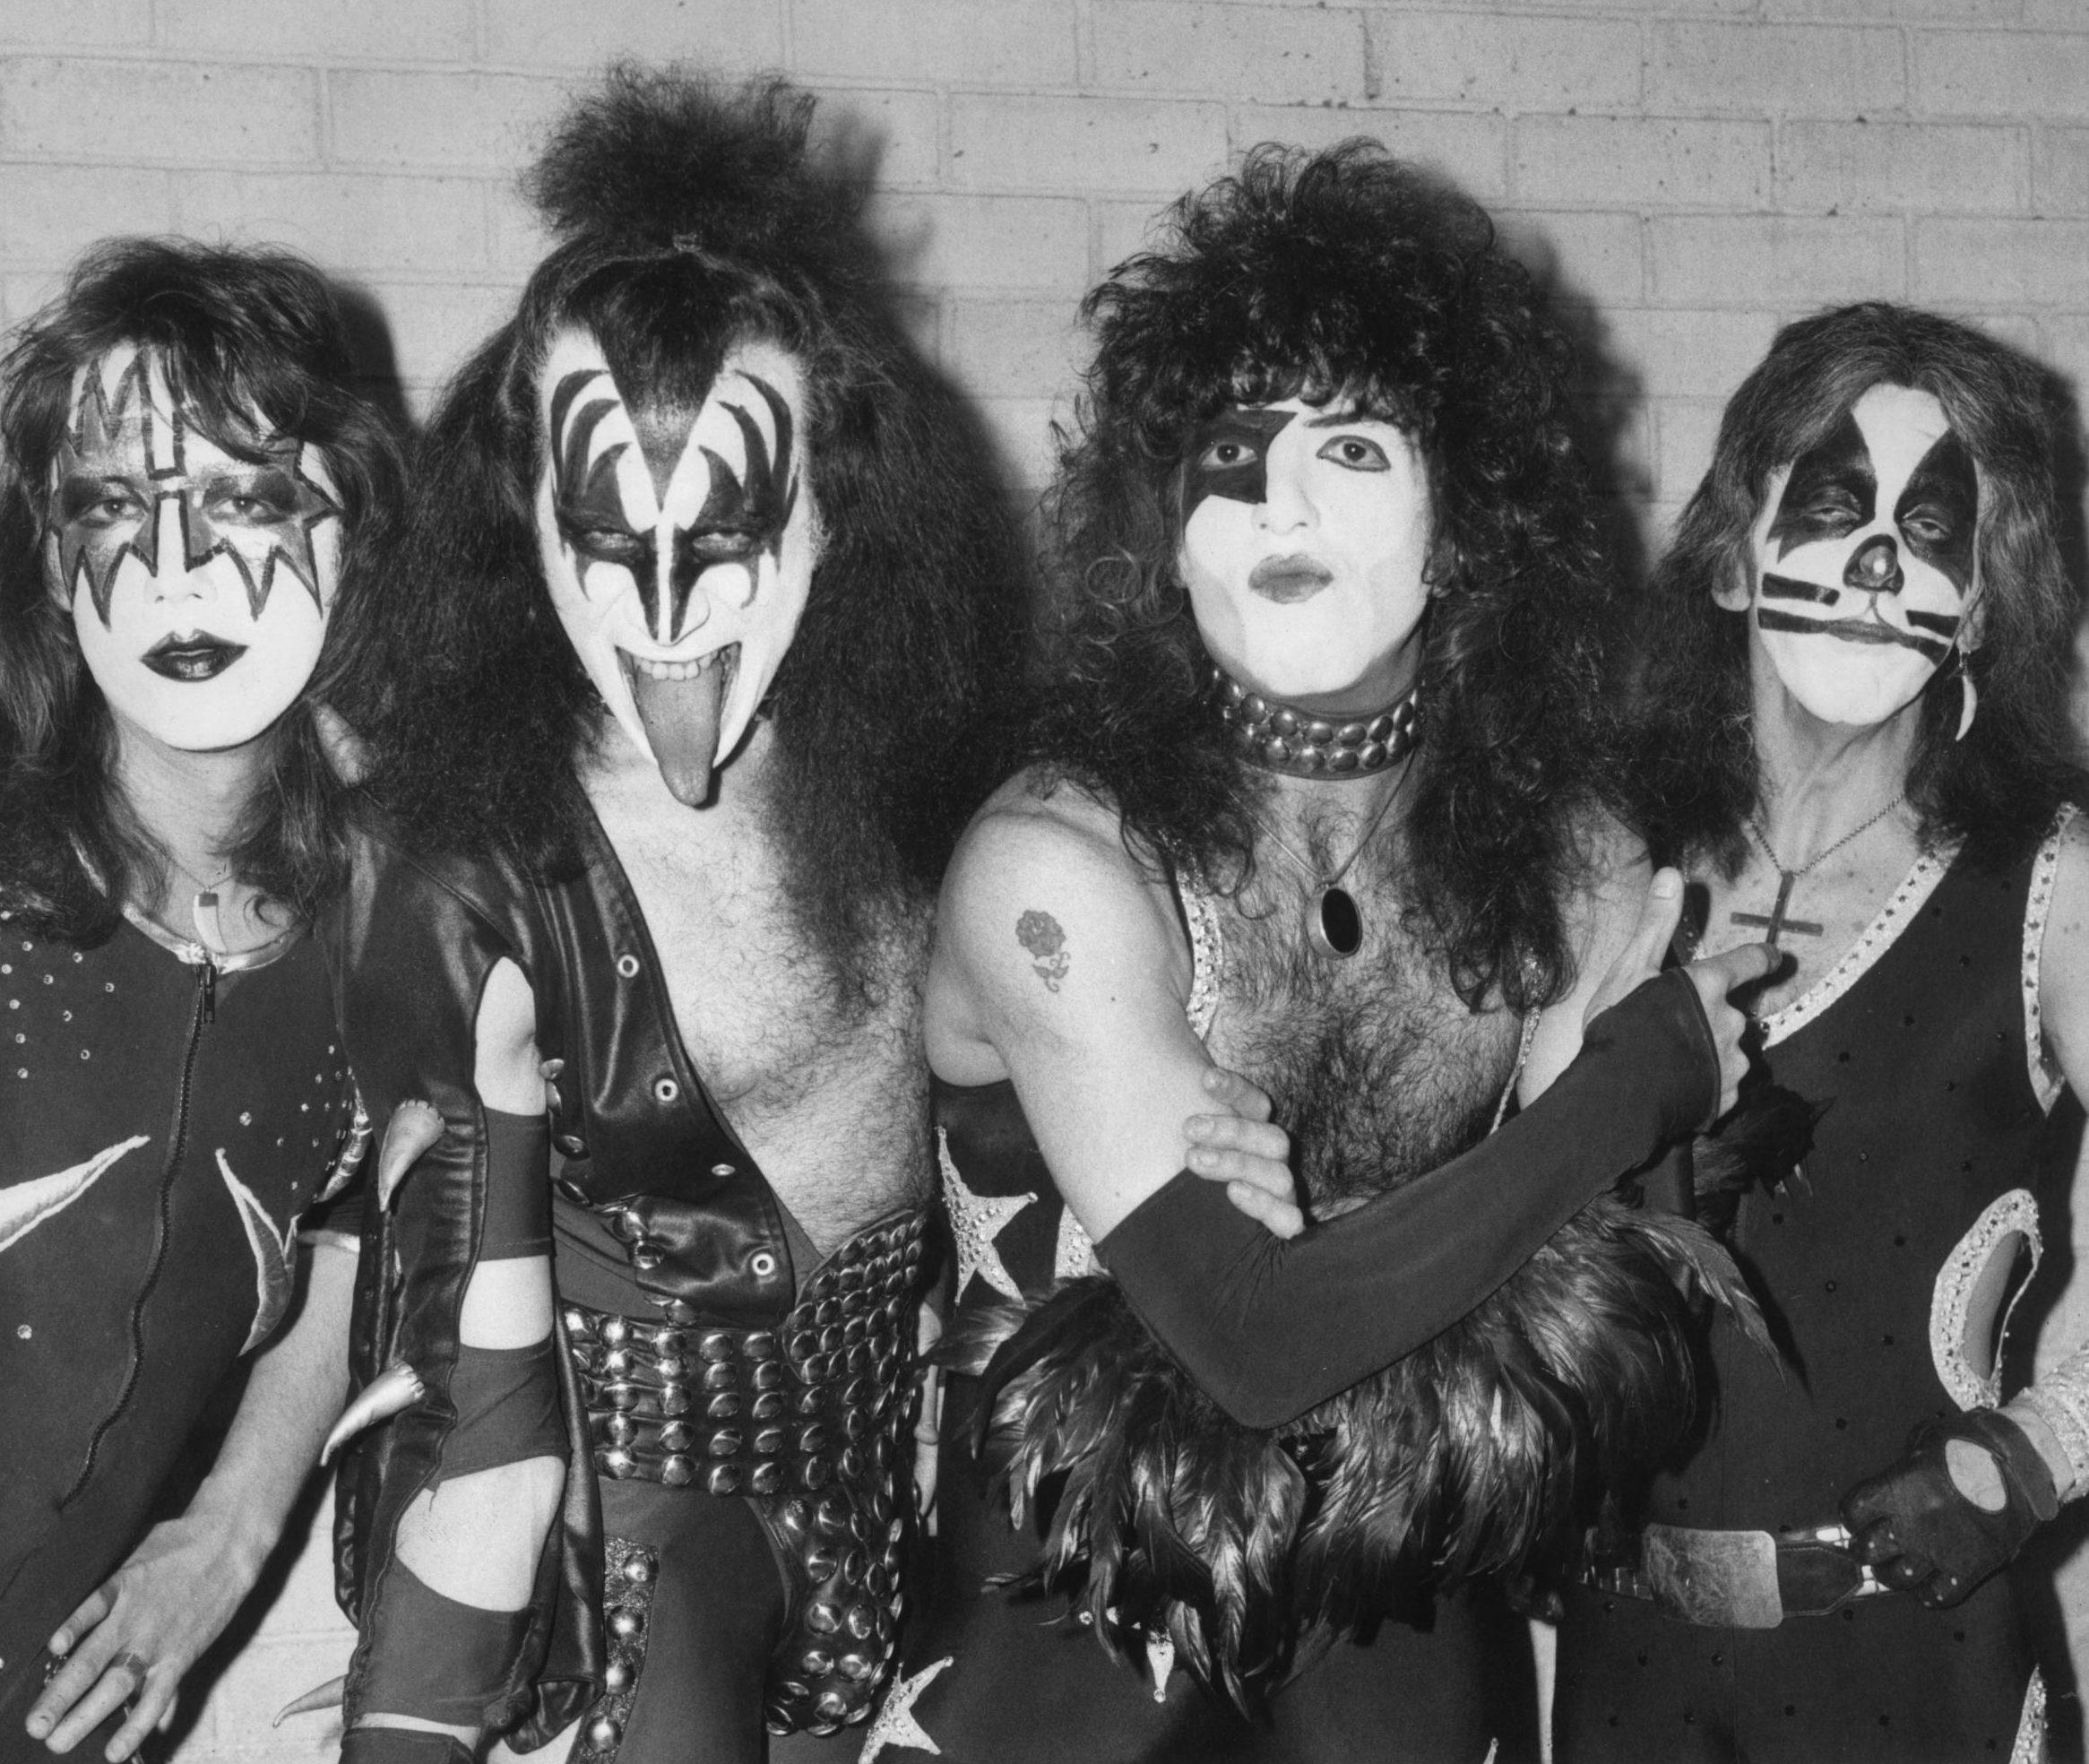 kiss 0807c e1604665421742 20 Facts About Rock Legends Van Halen That Will Make You Jump